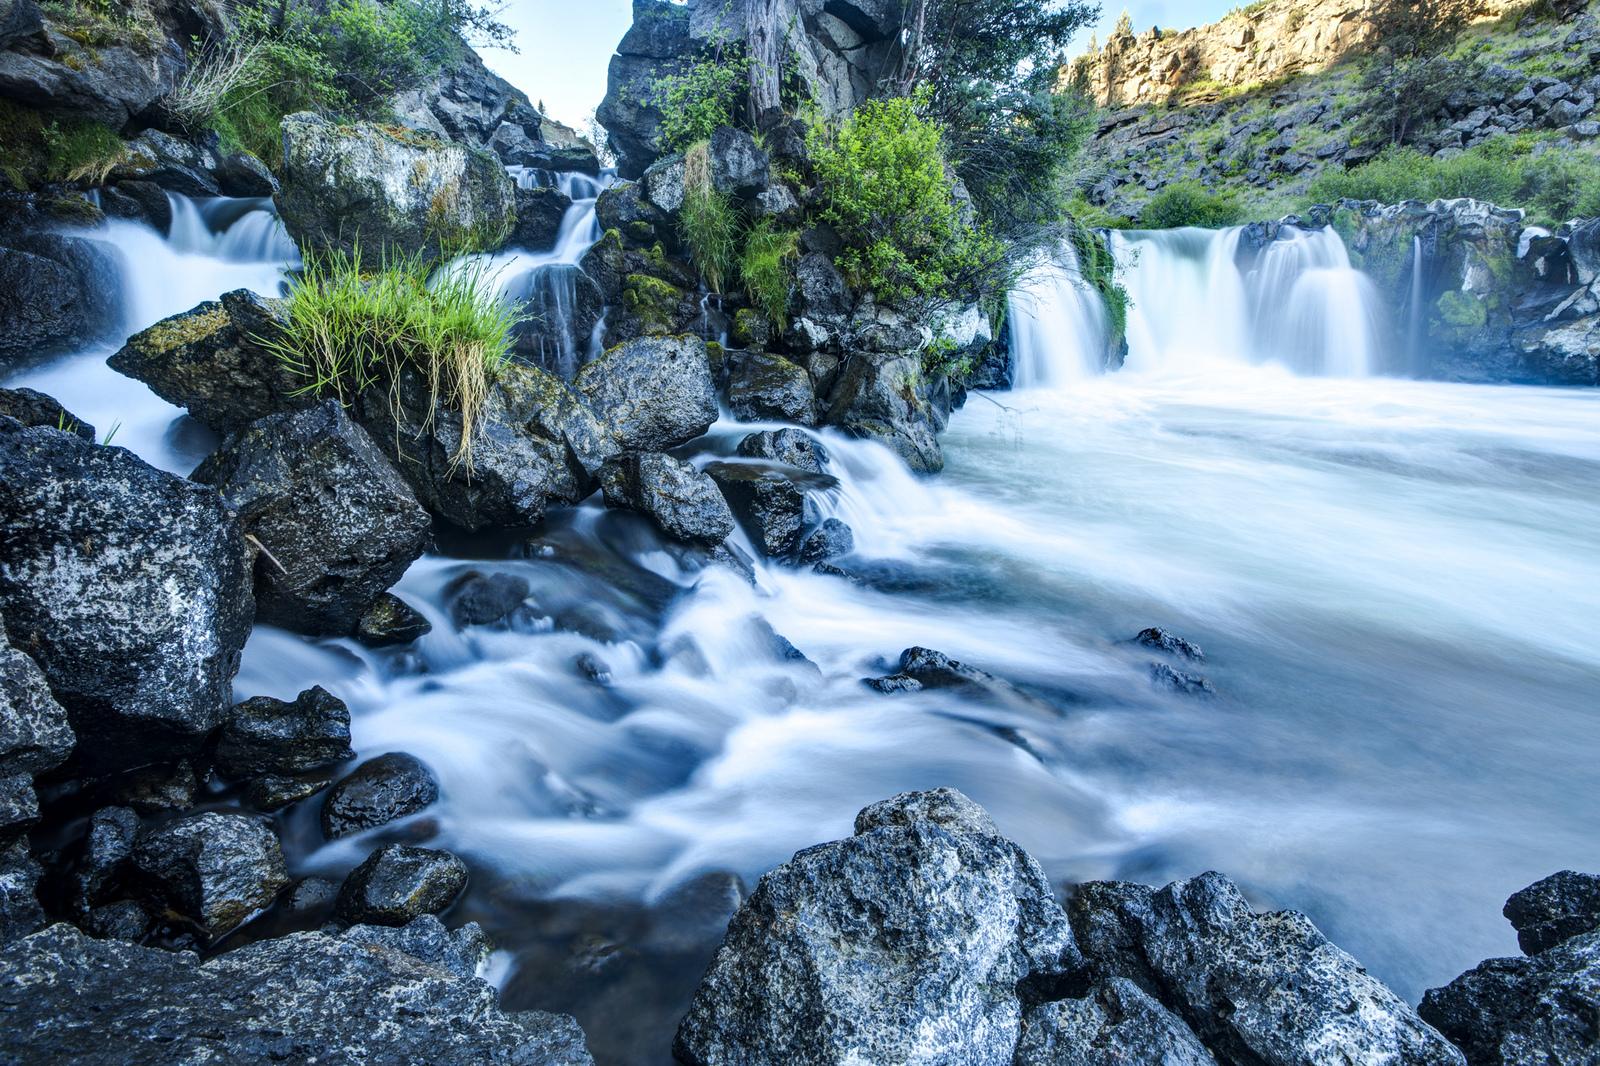 #conservationlands15 Social Media Takeover, August 15th, Bucket List - Oregon, Deschutes Wild and Scenic River | © Bureau of Land Management/Flickr